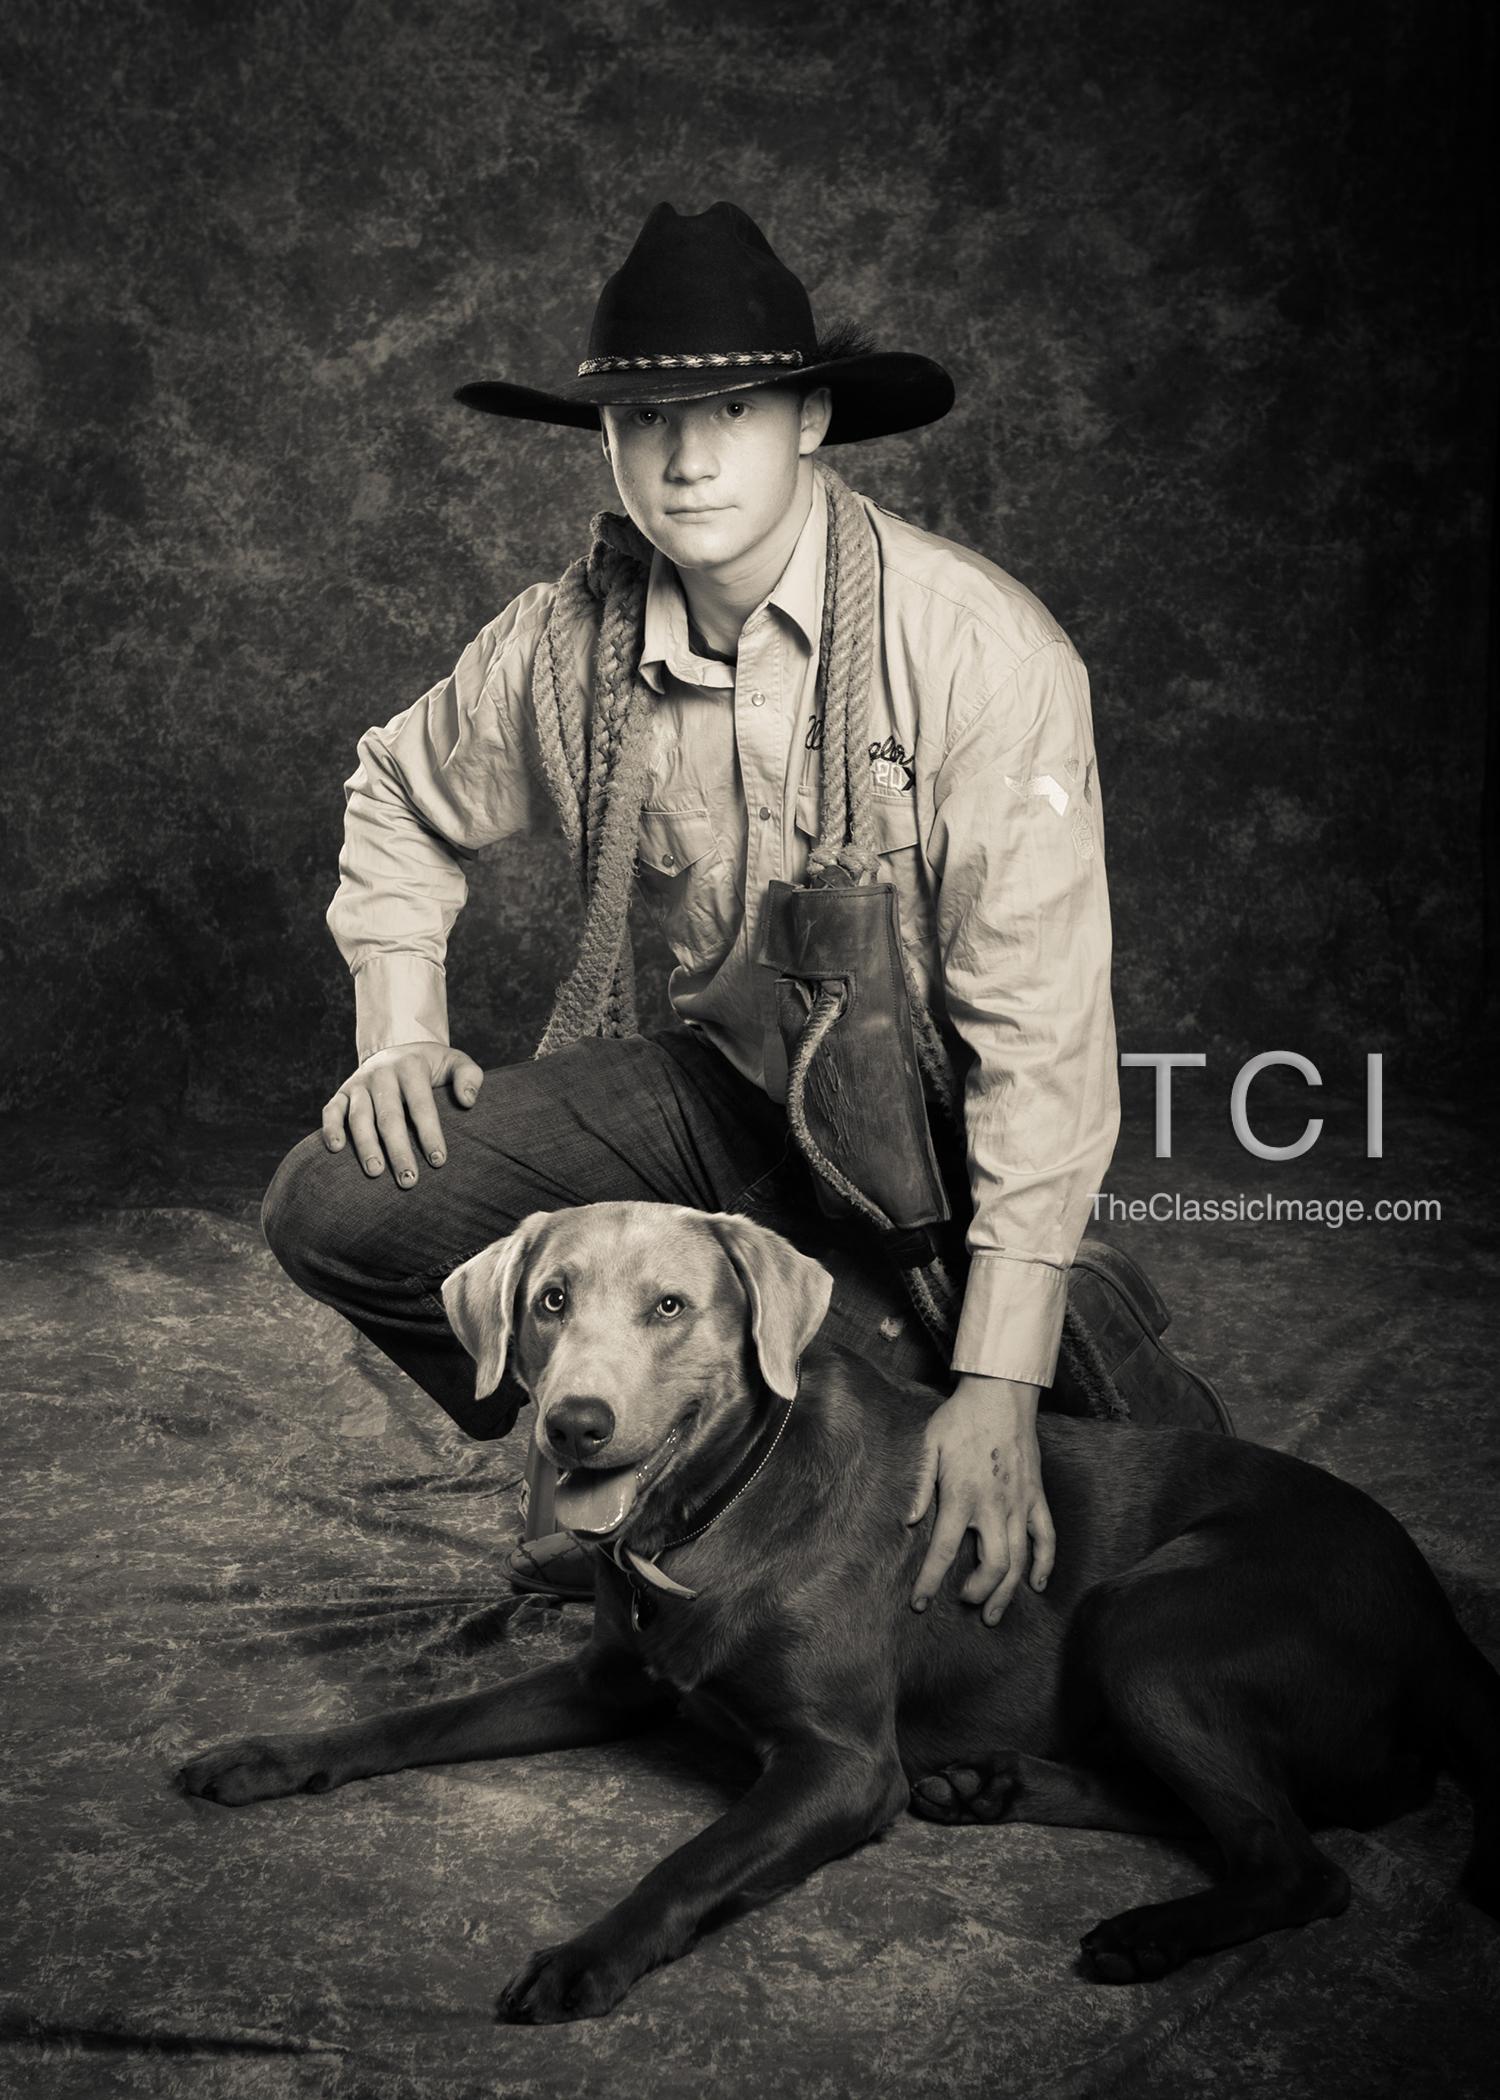 Cowboy and Duke